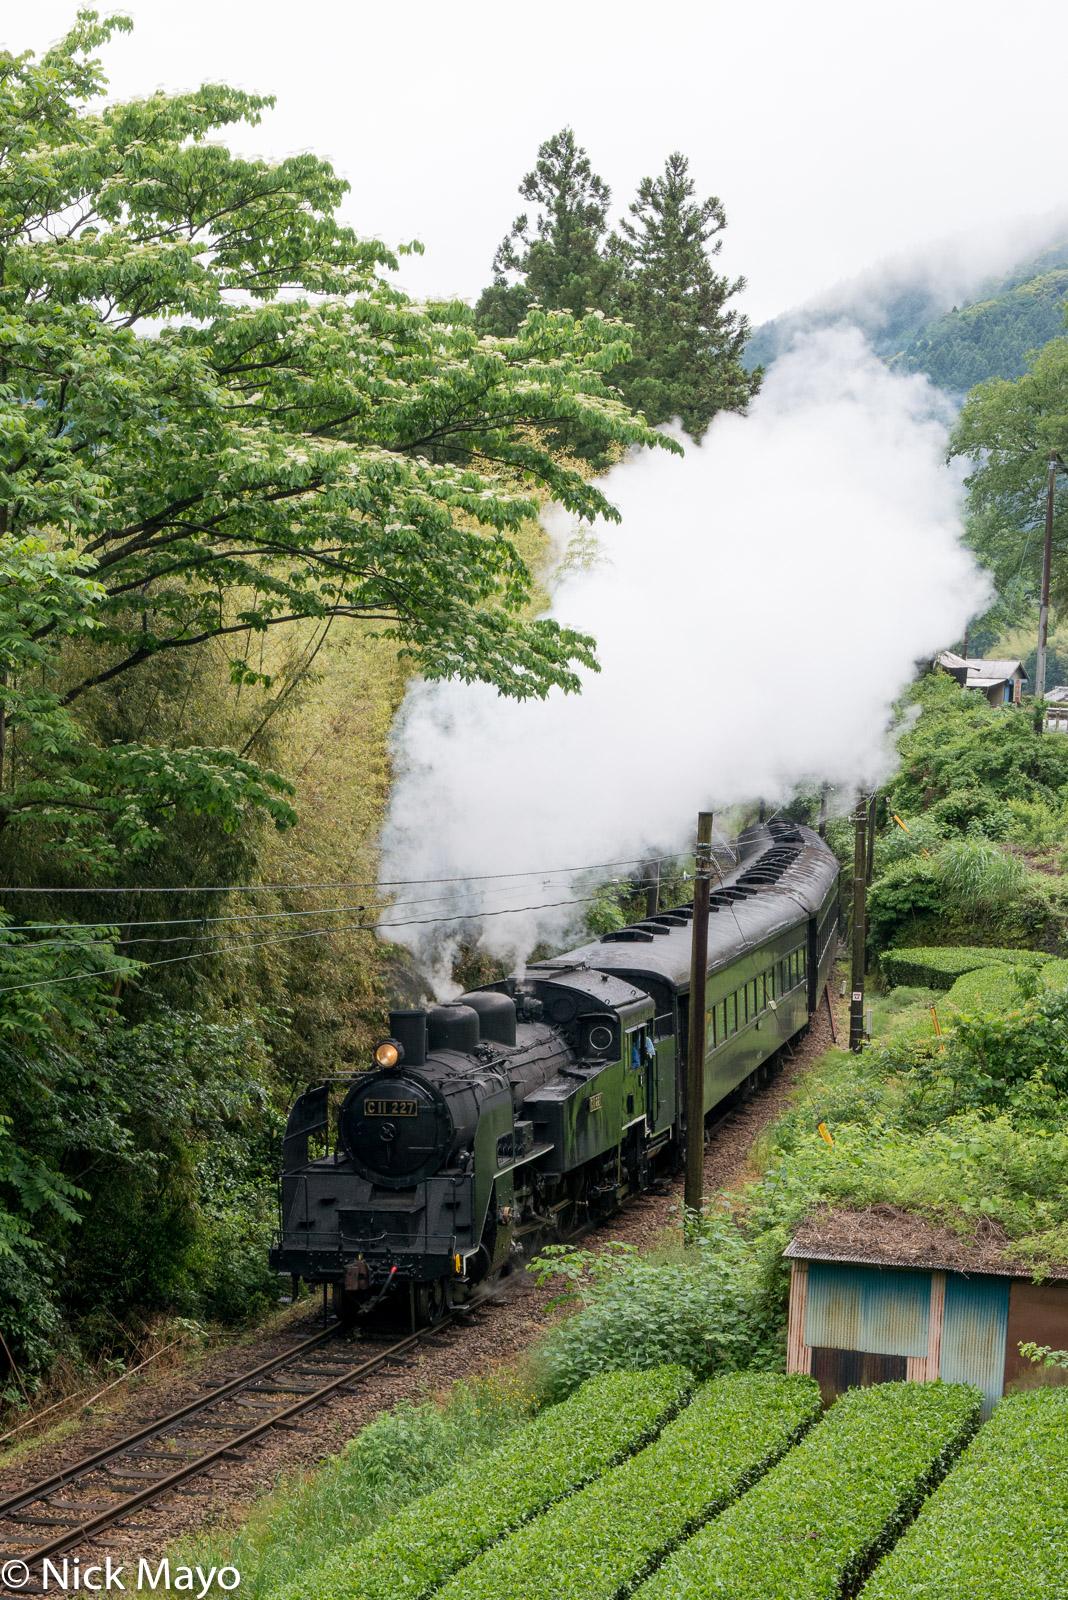 Japan, Kanto, Train, photo